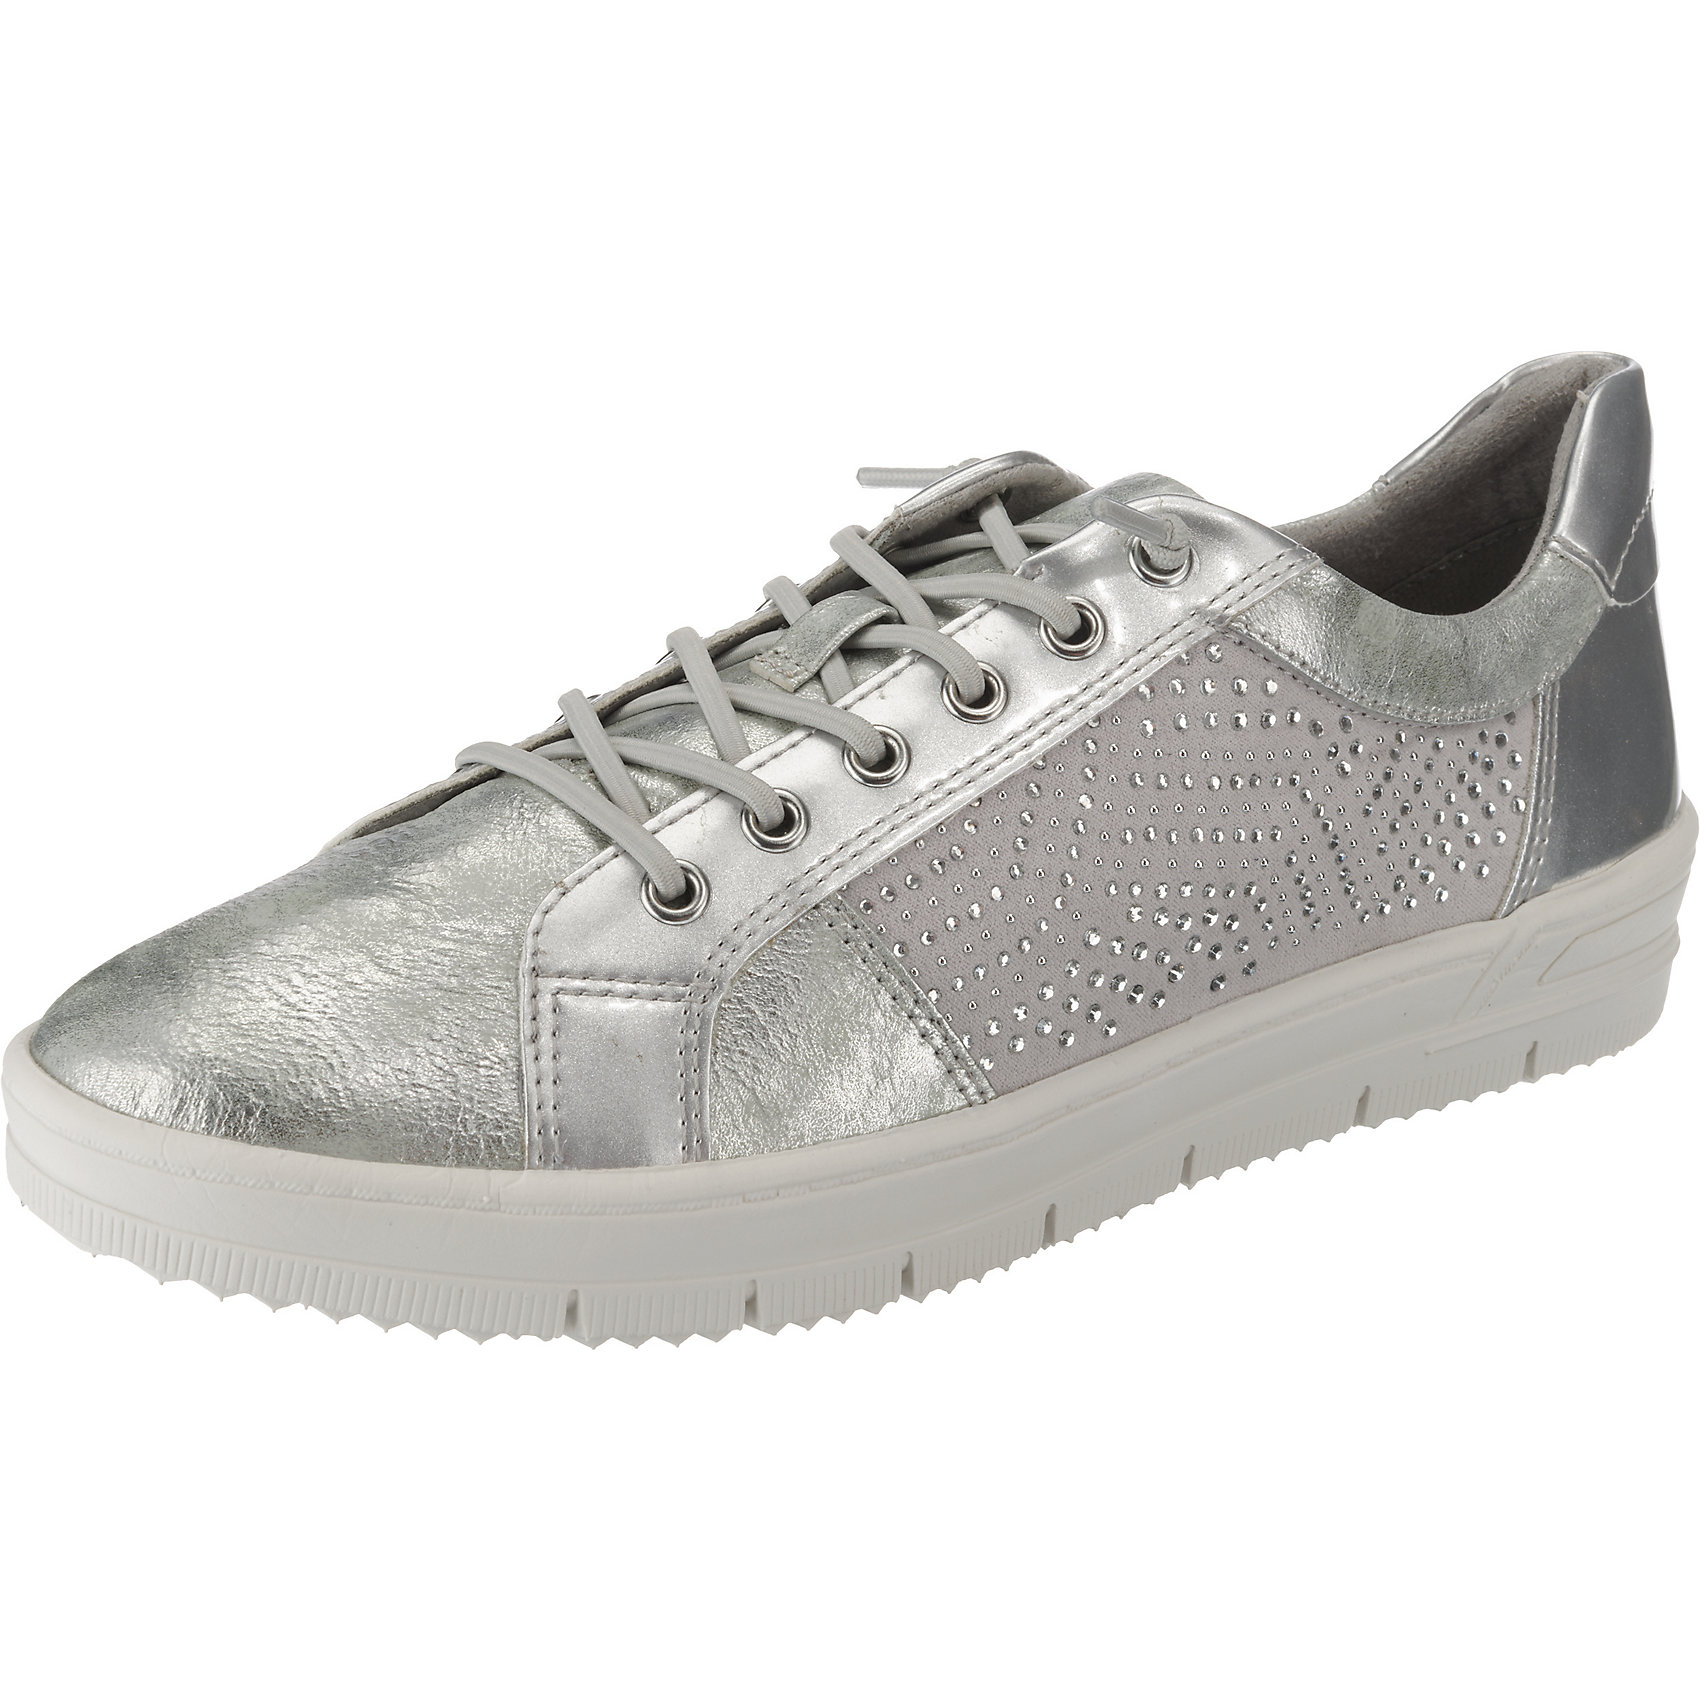 Neu Tamaris Sneakers Low 8453419 für Damen silber